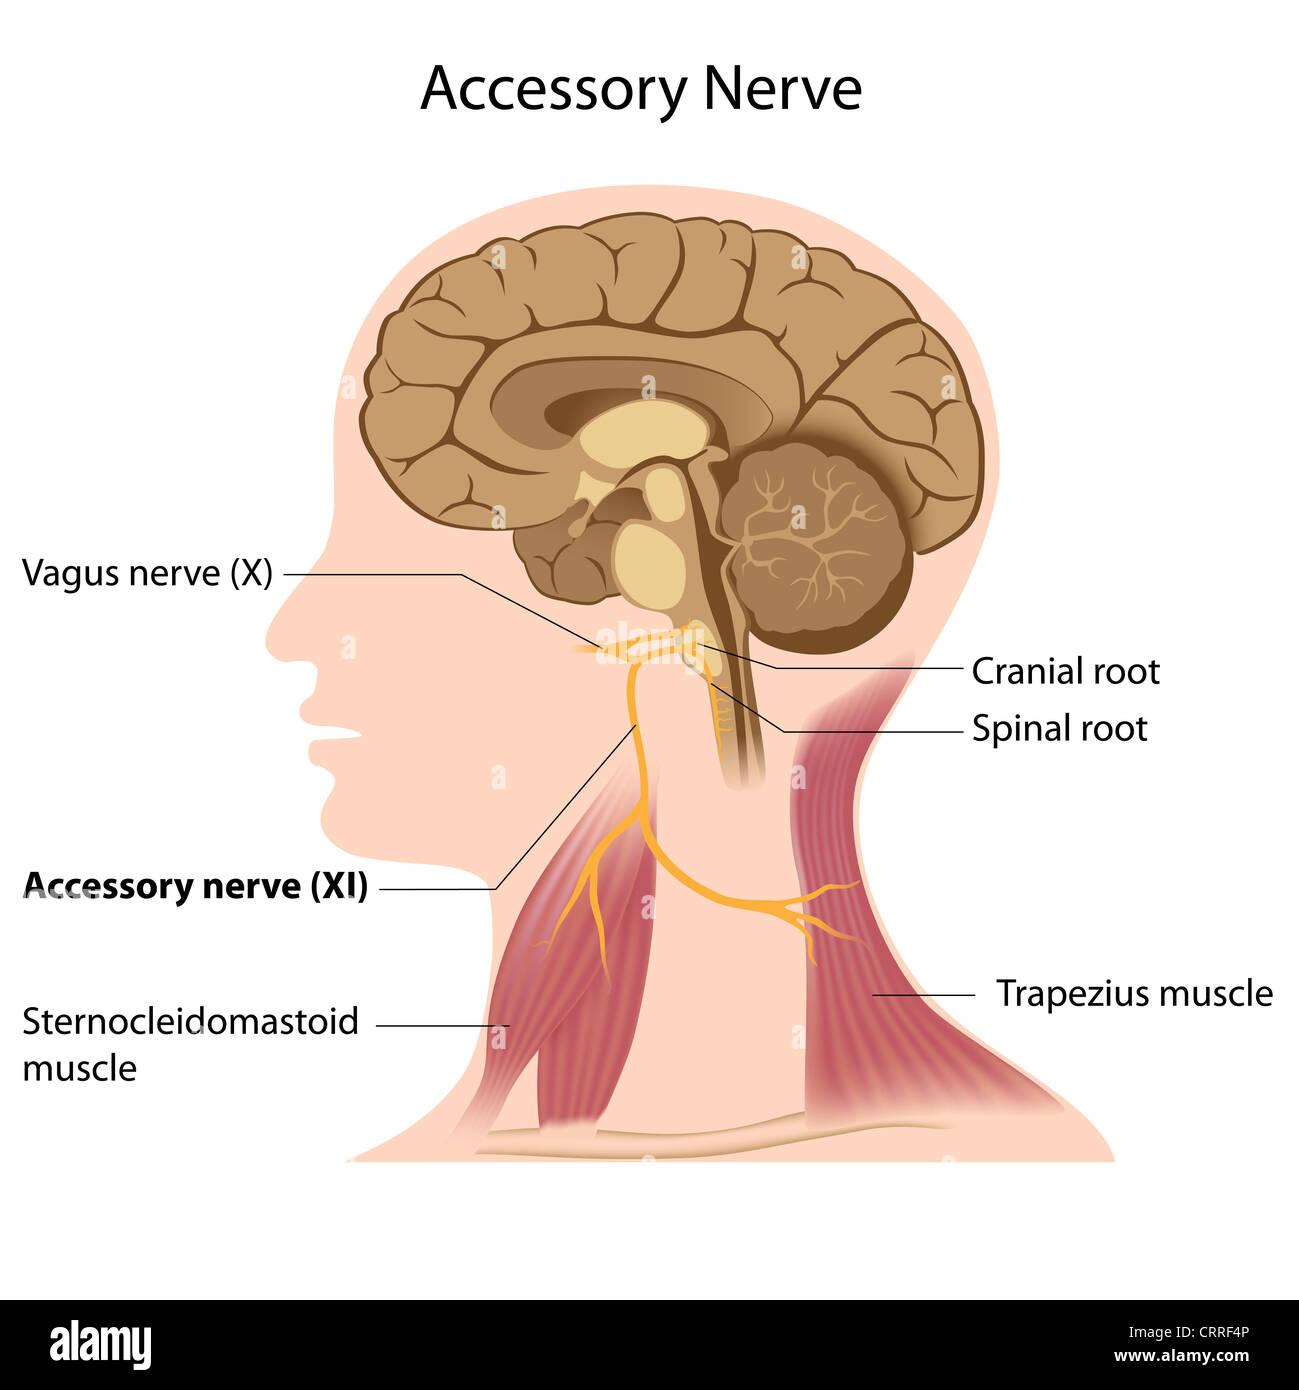 Accessory Nerve Anatomy Stock Photo 49074614 Alamy